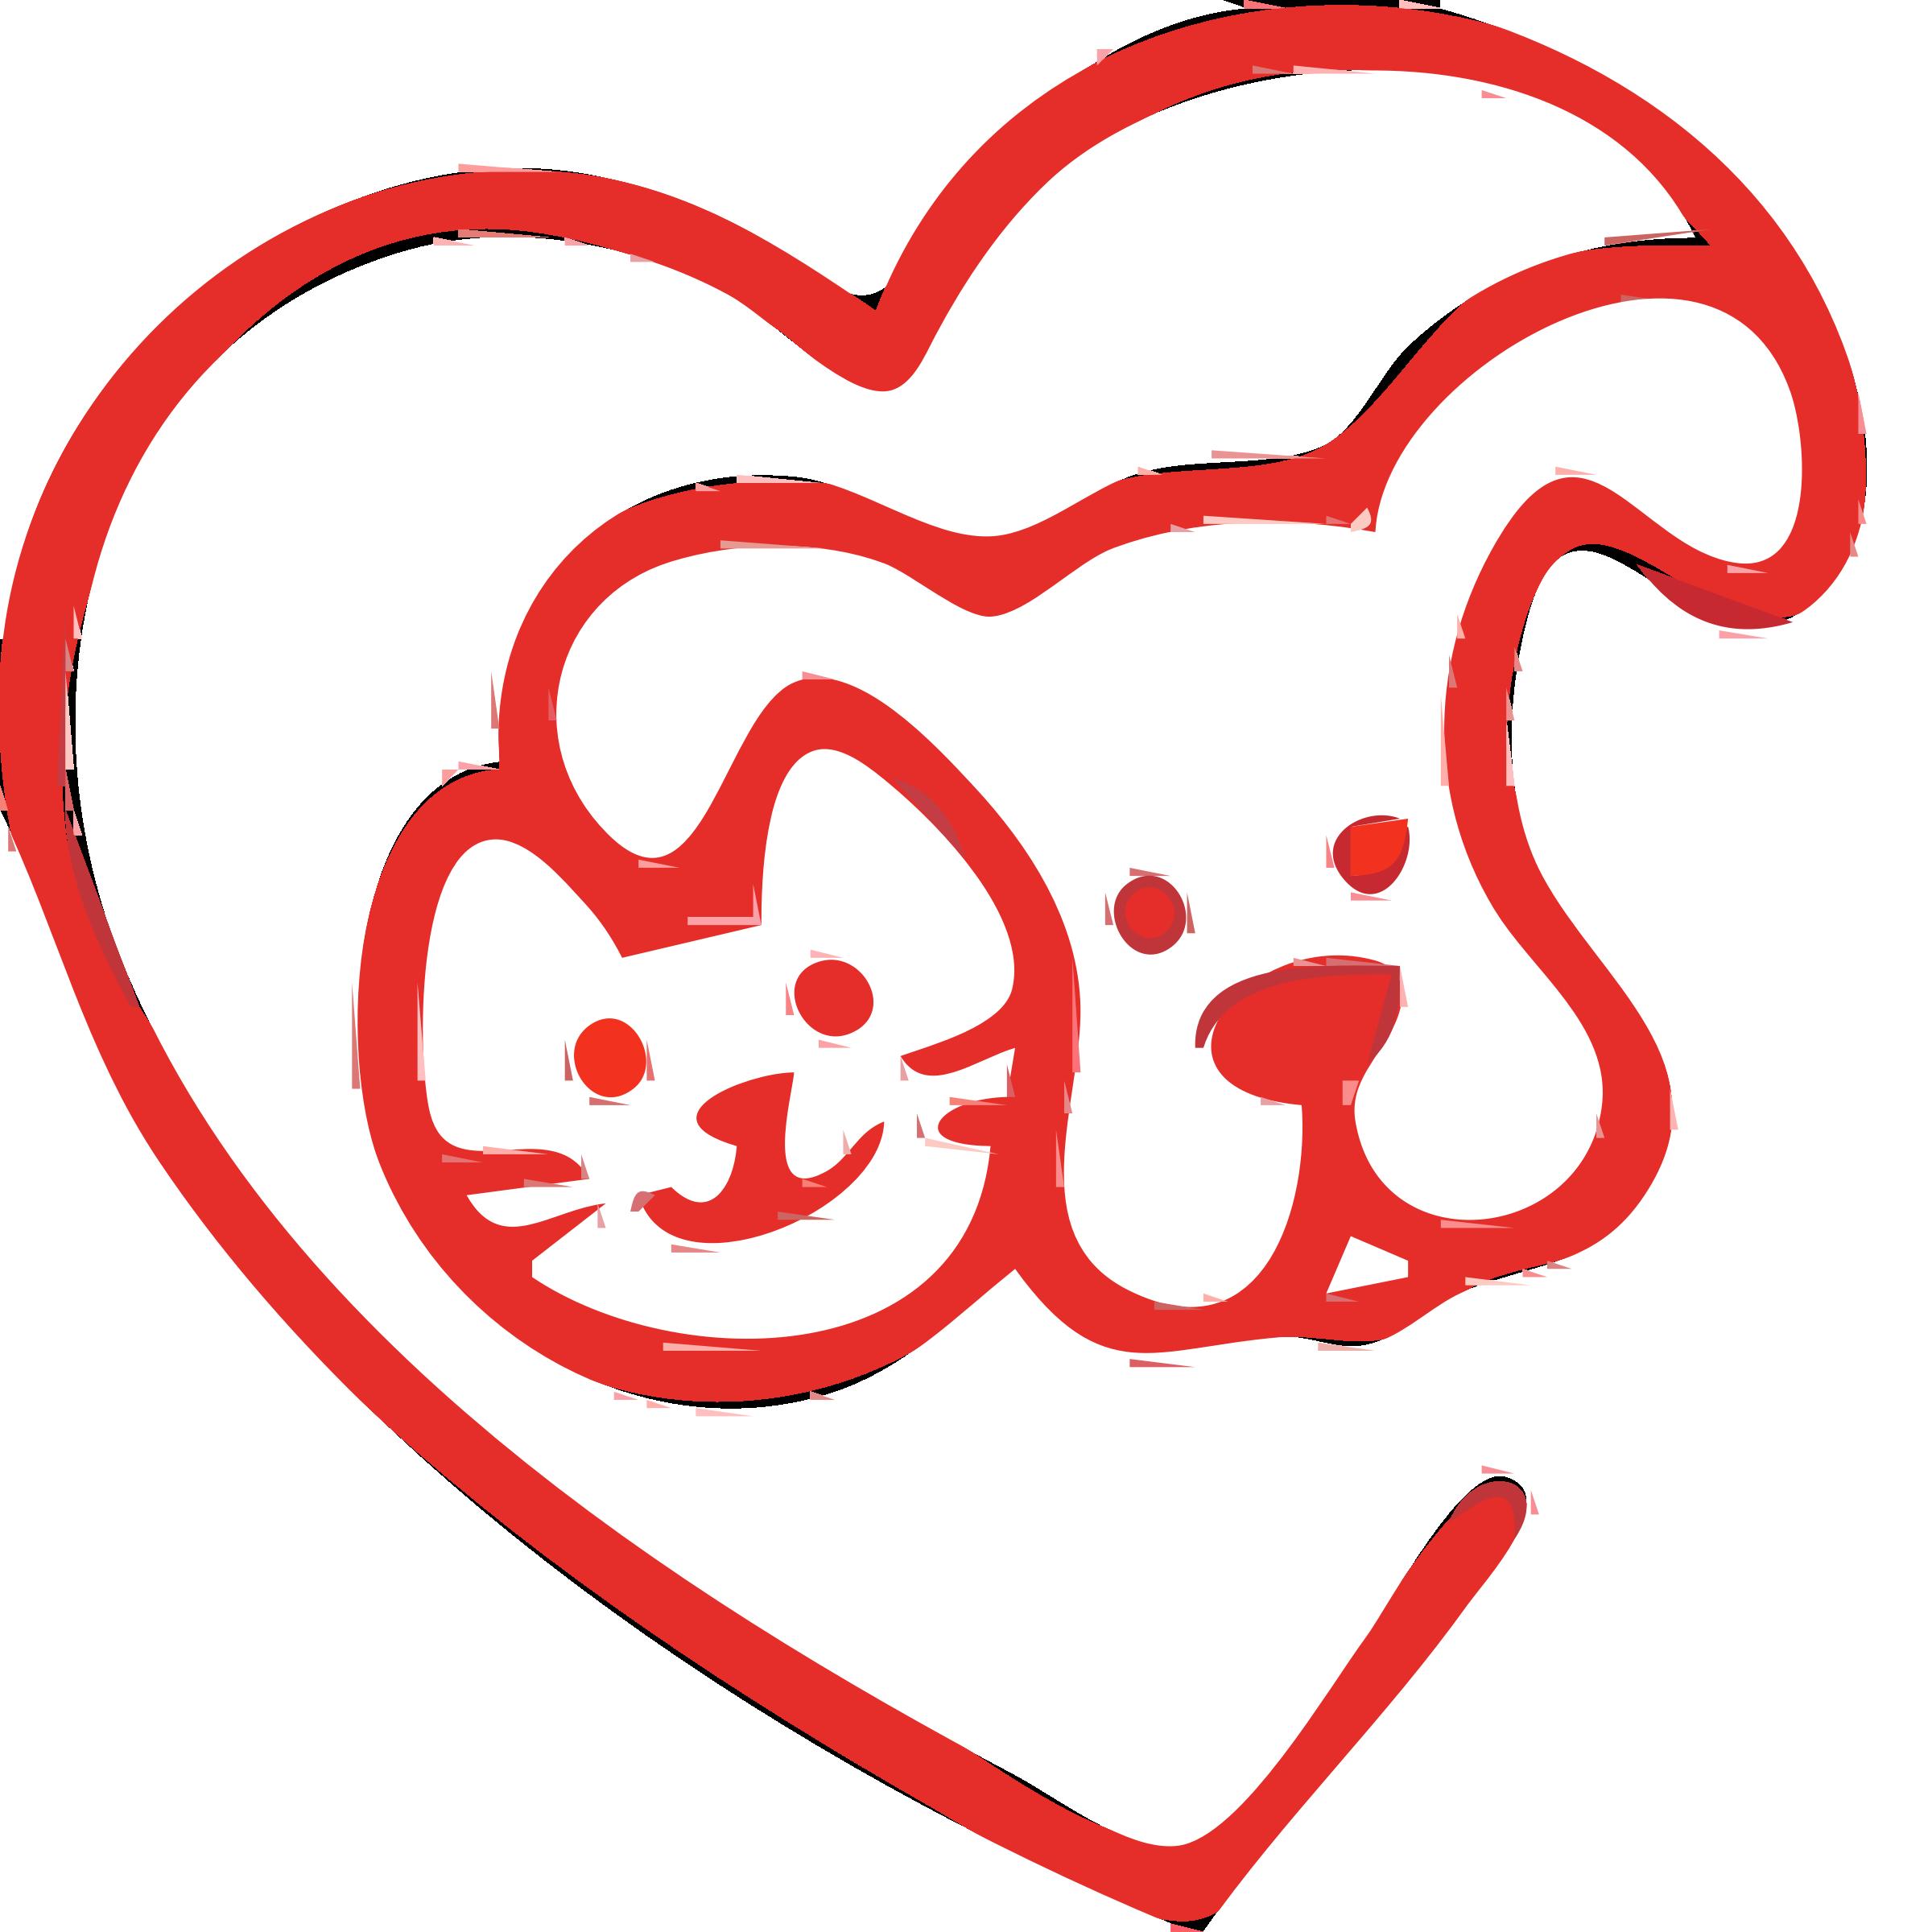 love animals I love animals - you love animals - we love animals animal compilation- animal love - love animals - we all love animals music: bensoundcom - memories.